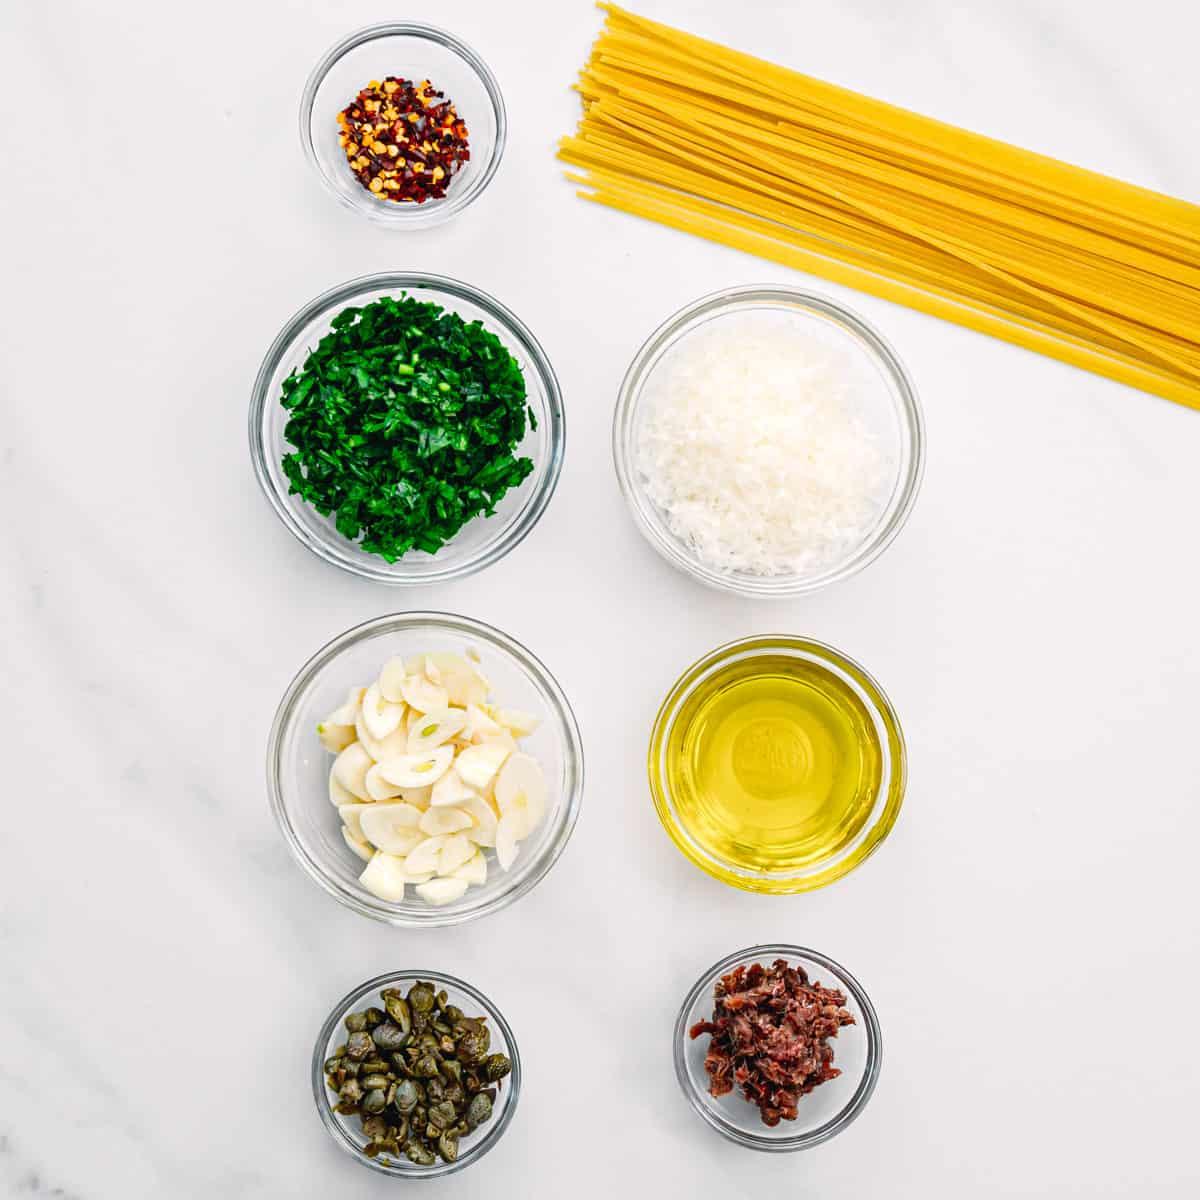 ingredients for midnight pasta.